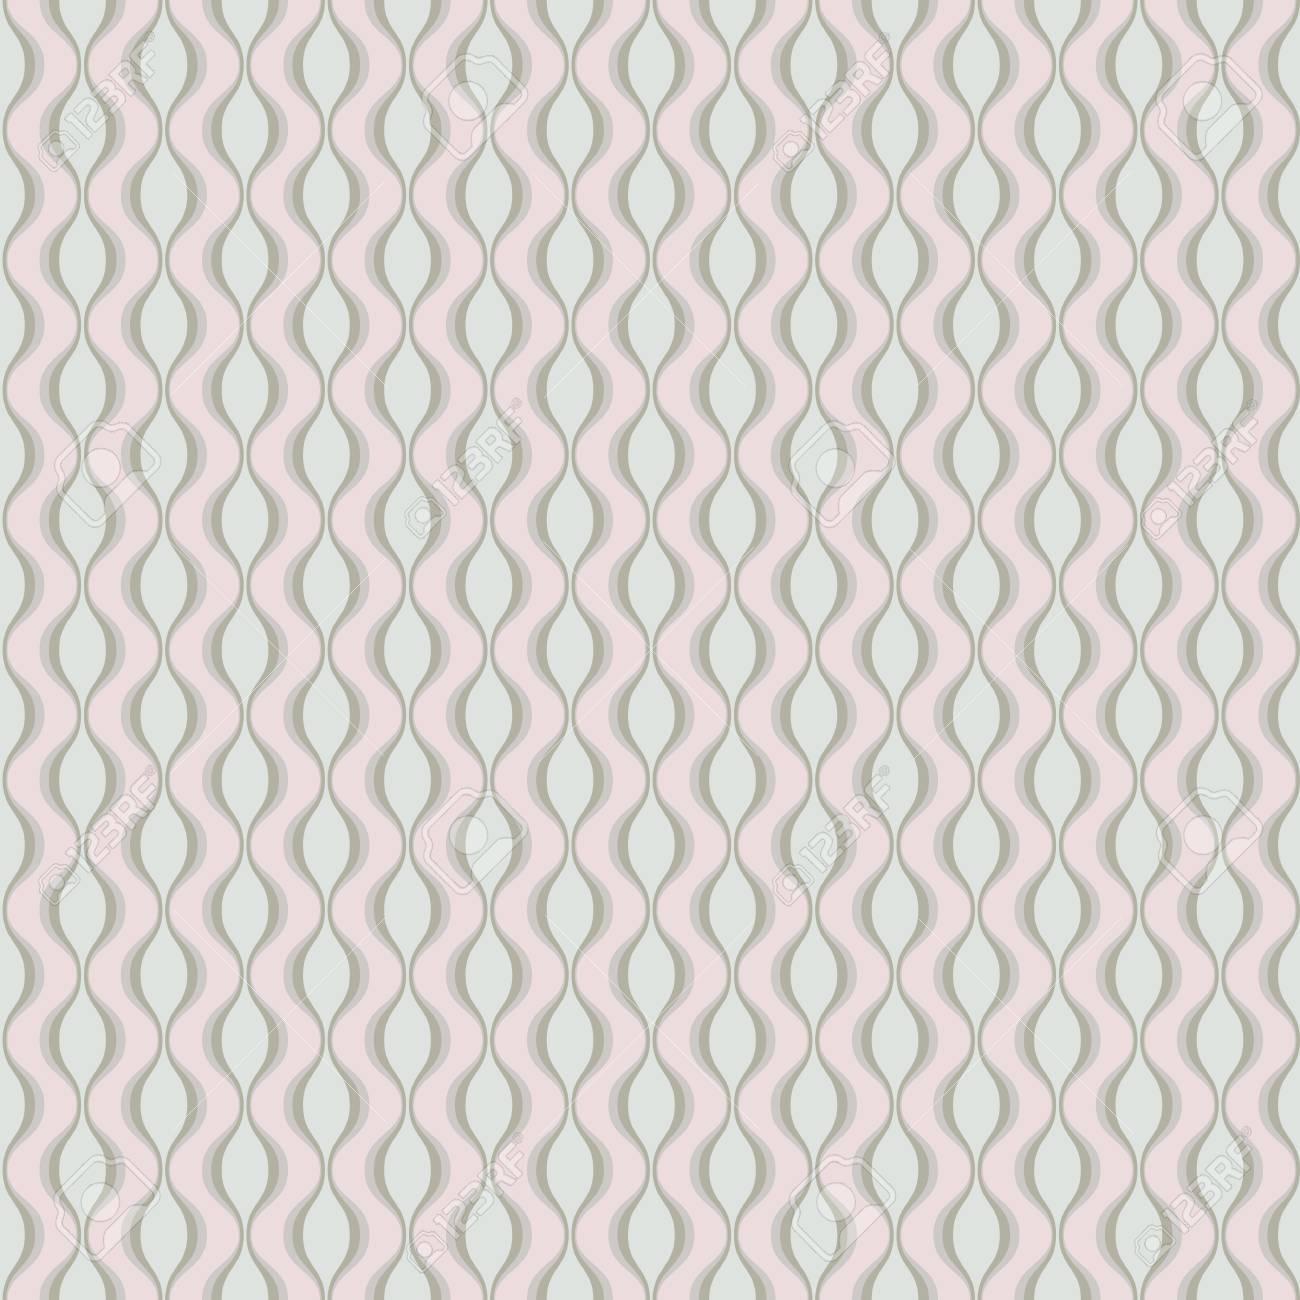 An Elegant Seamless Victorian Wallpaper Background Spiral Curve